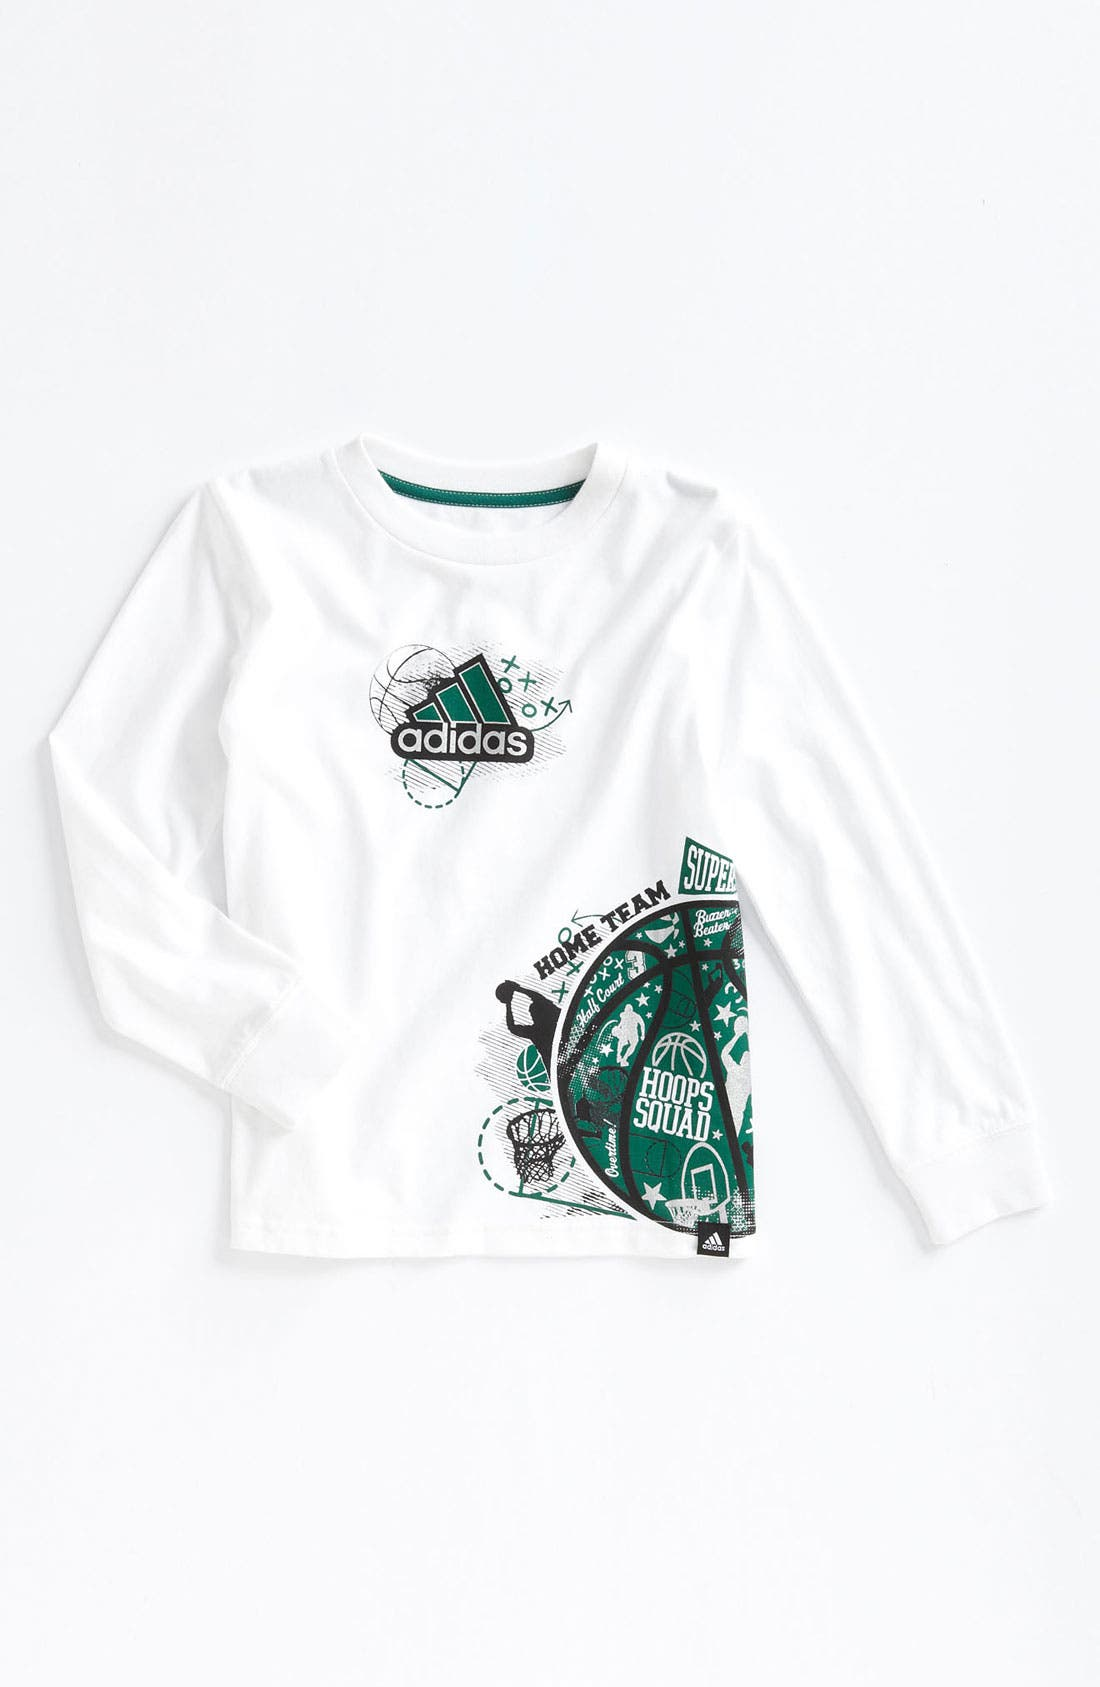 Alternate Image 1 Selected - adidas 'Playbook' T-Shirt (Little Boys)